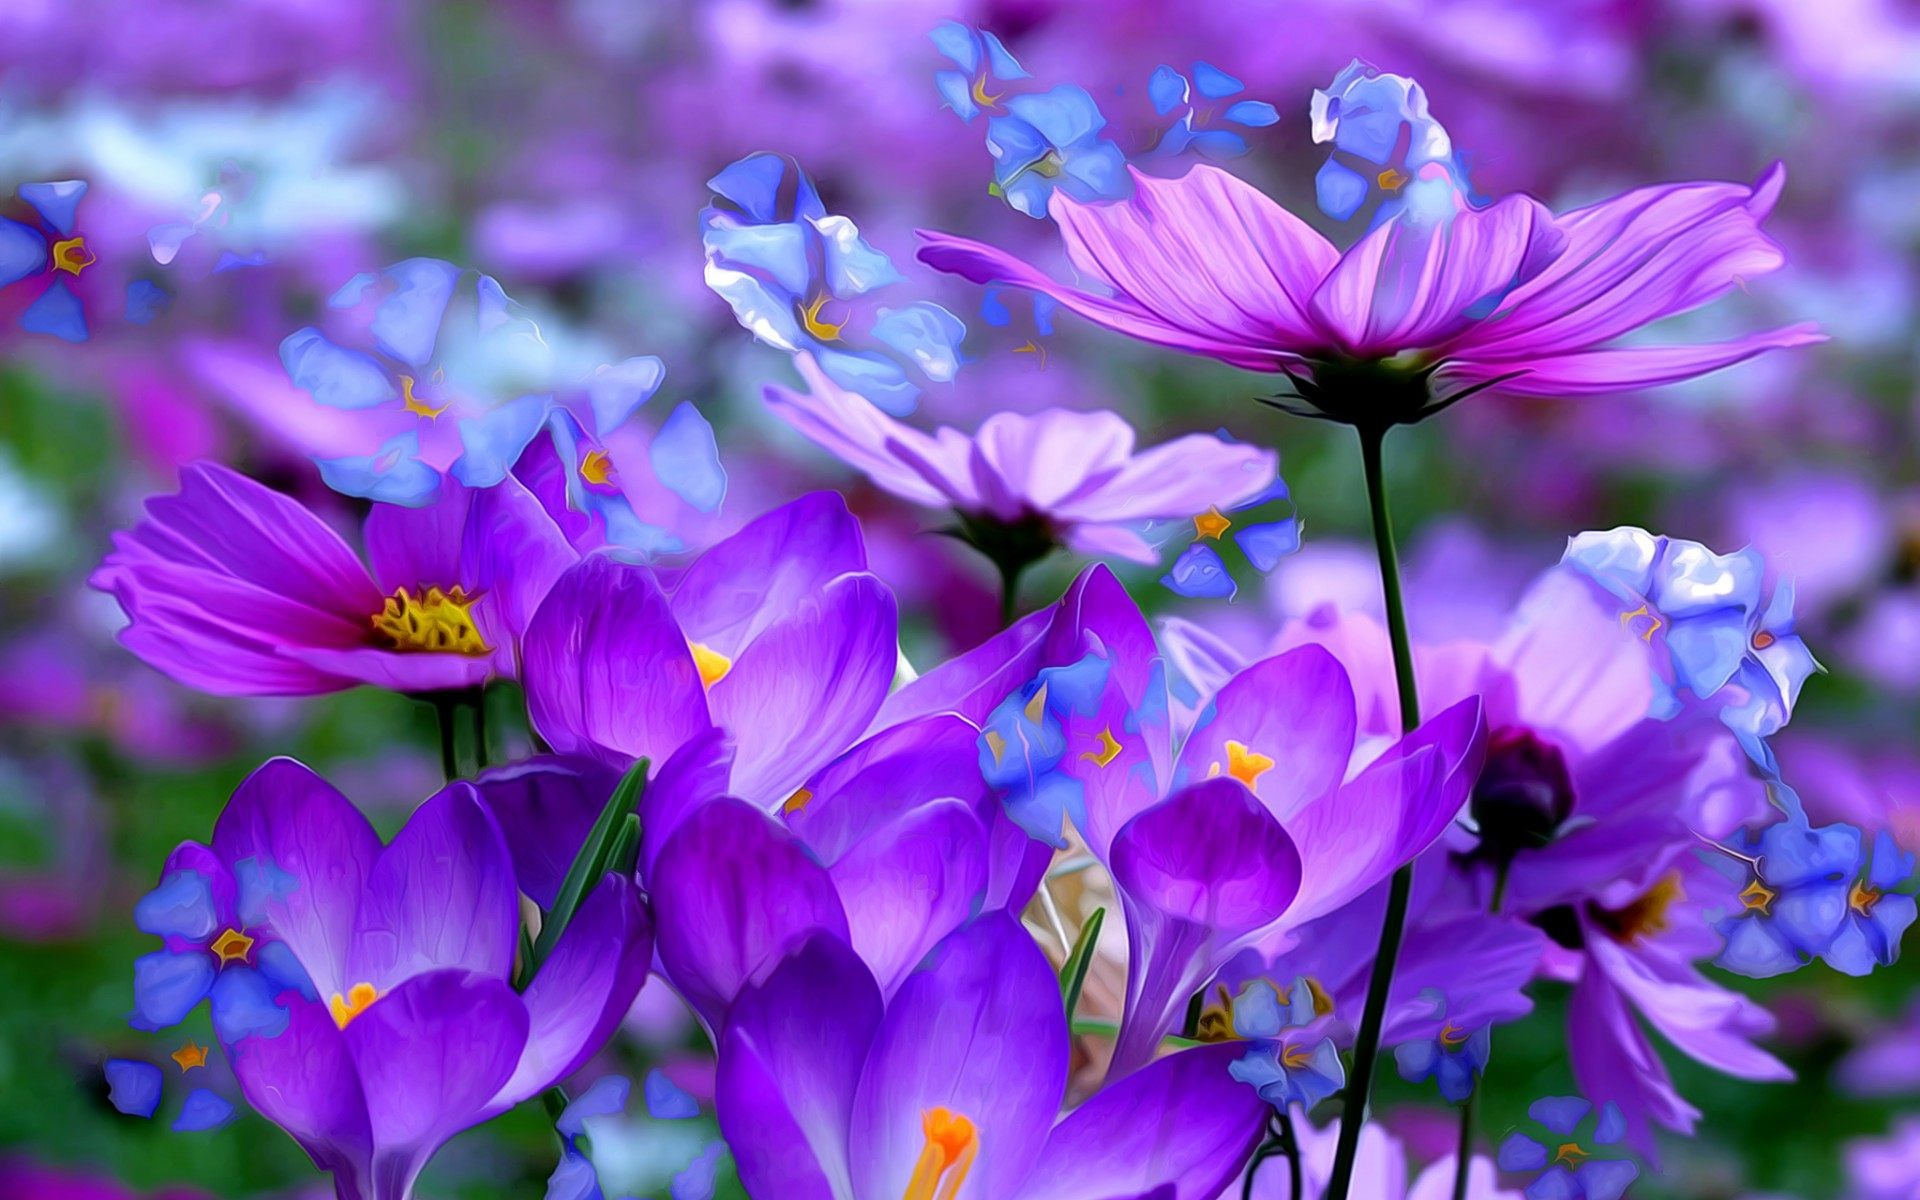 Purple Flower Wallpaper High Quality